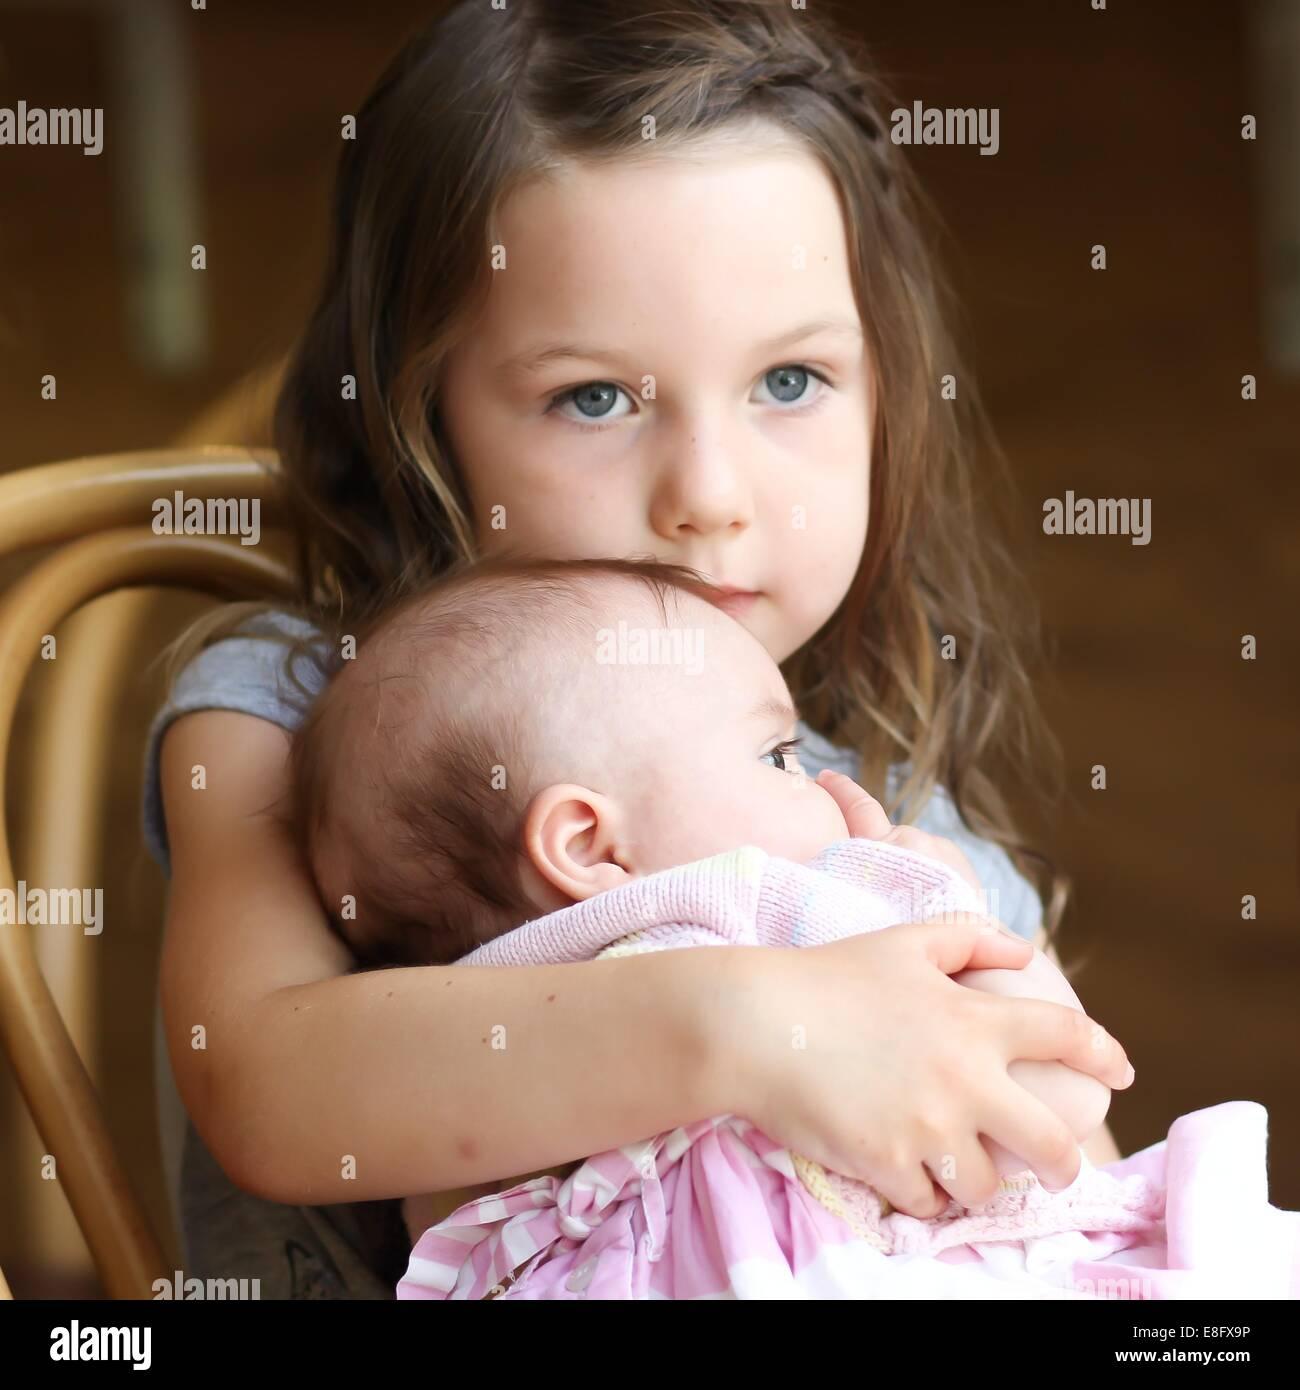 Girl (4-5 years) cuddling baby sister - Stock Image